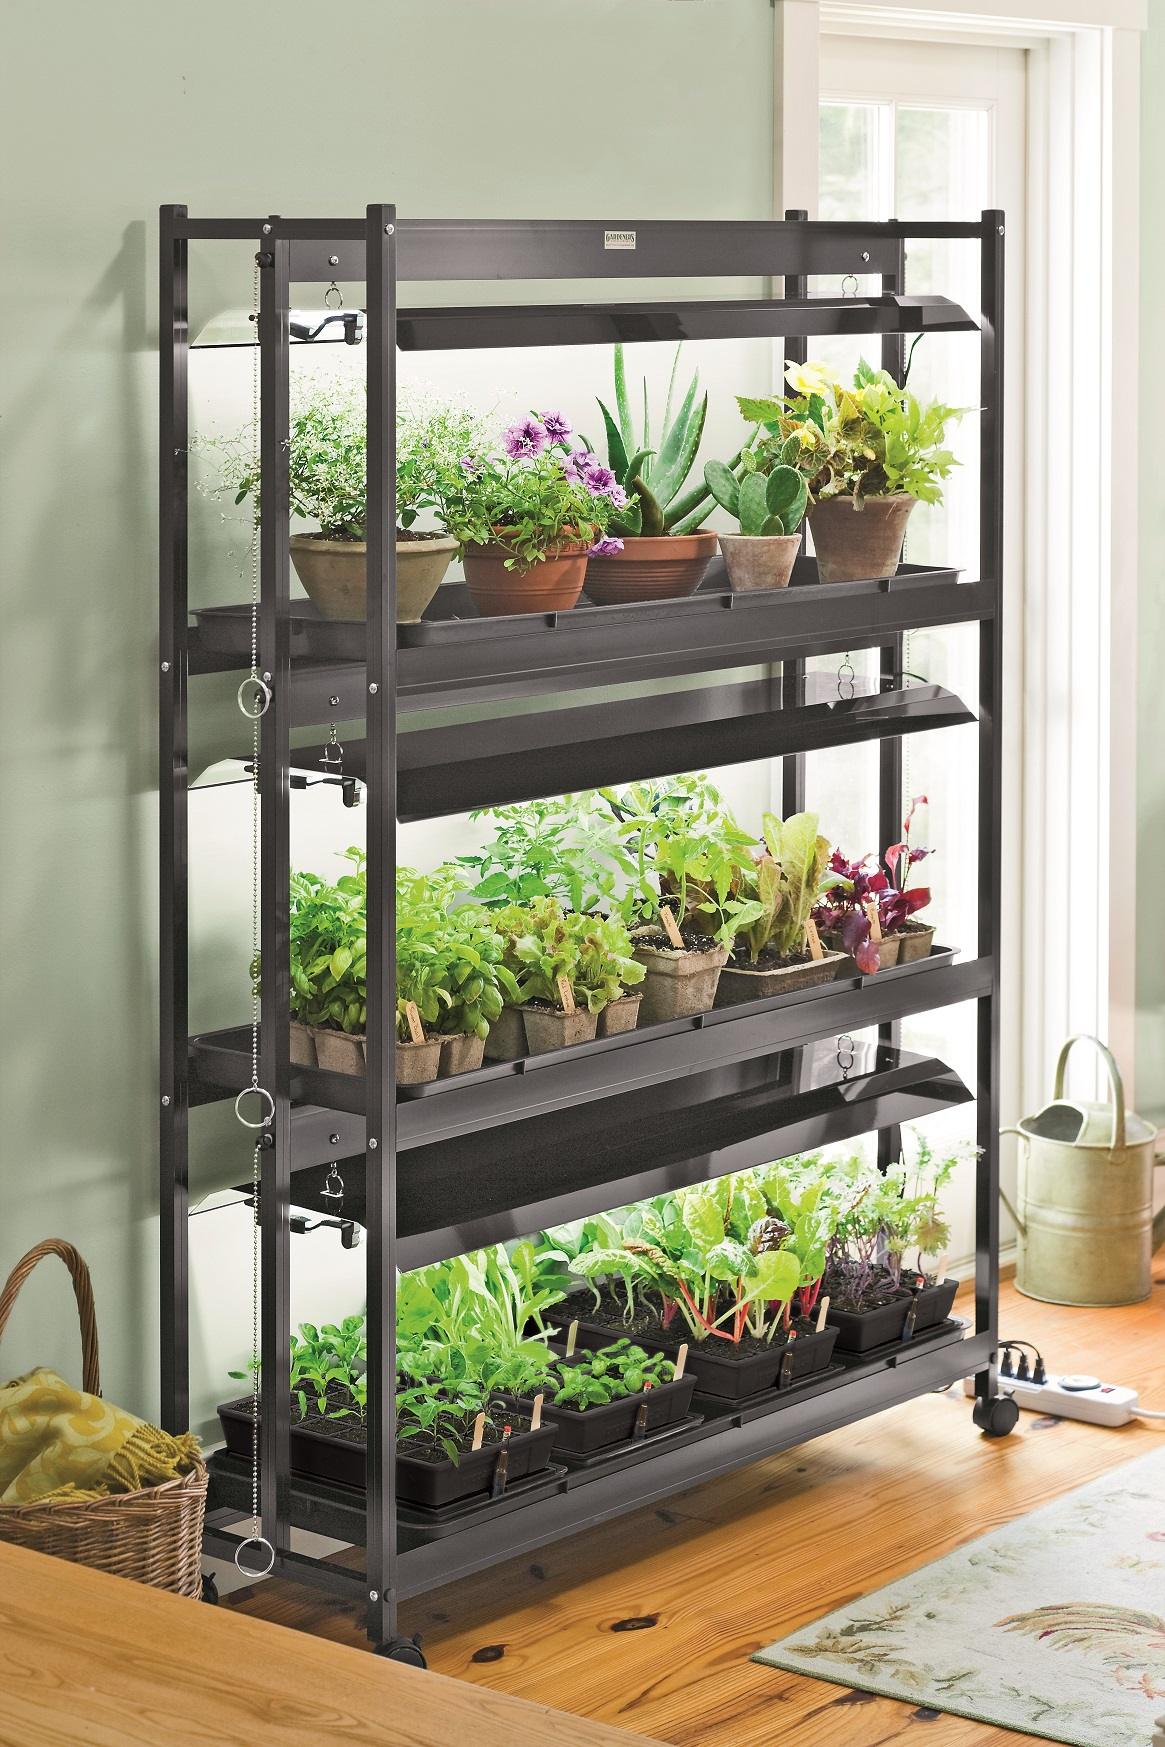 Indoor Grow Lights Houseplants photocredit_GardenersSupplyCompany